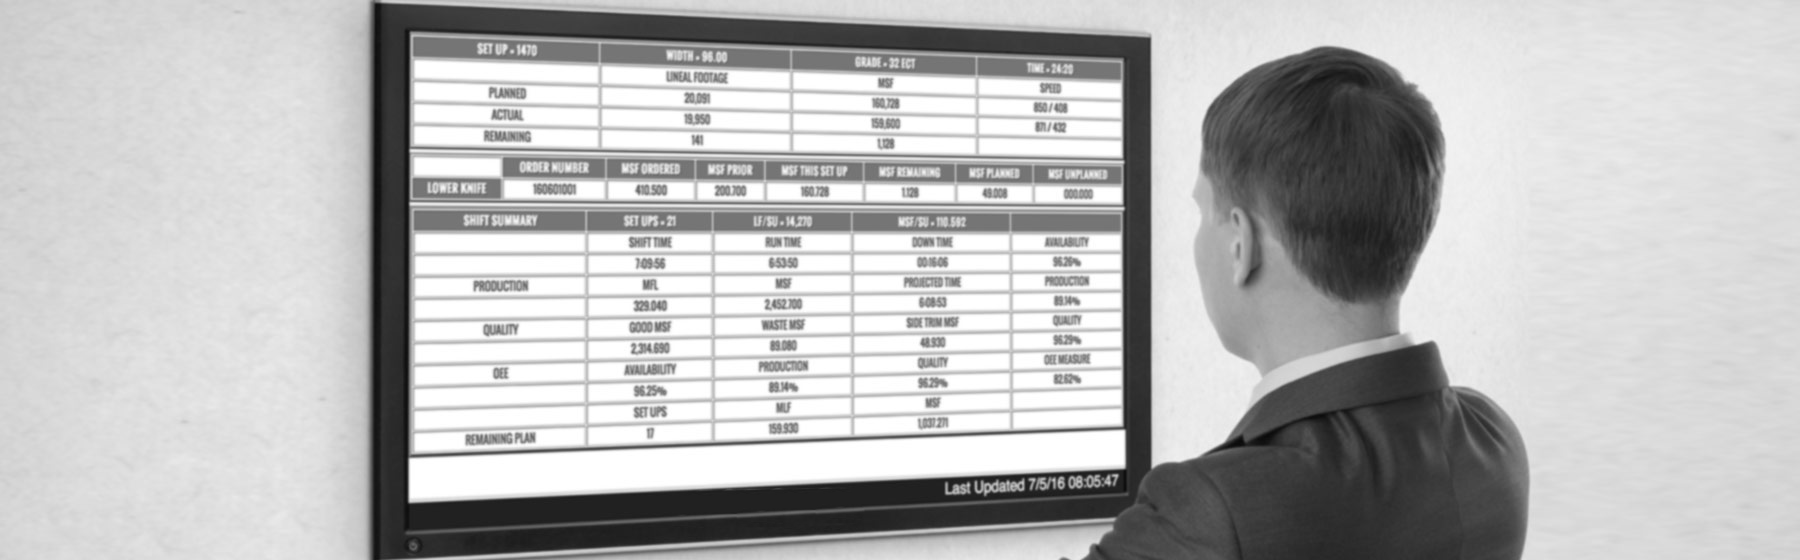 NO AVISTA scoreboard-slider.png